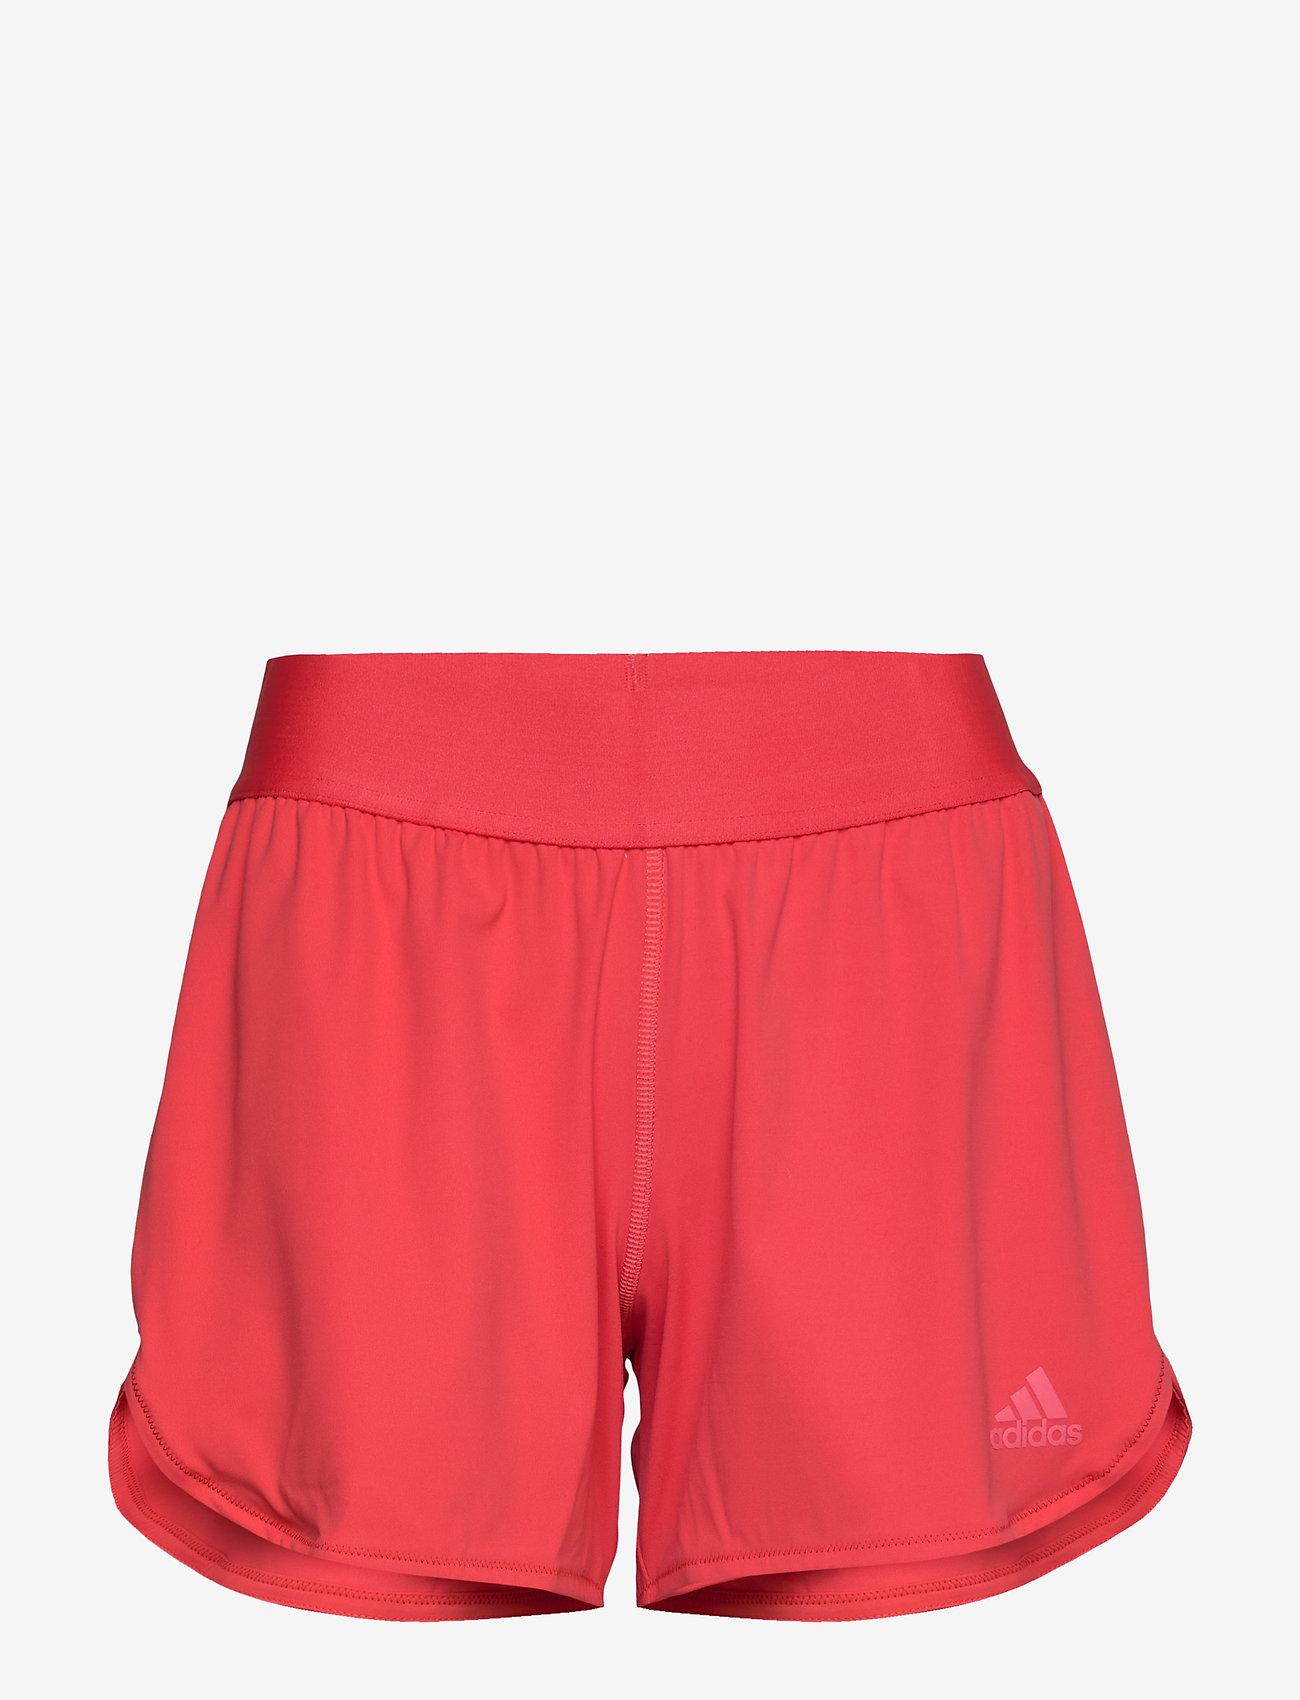 adidas Performance TRG SHO H.RDY - Shorts GLORED